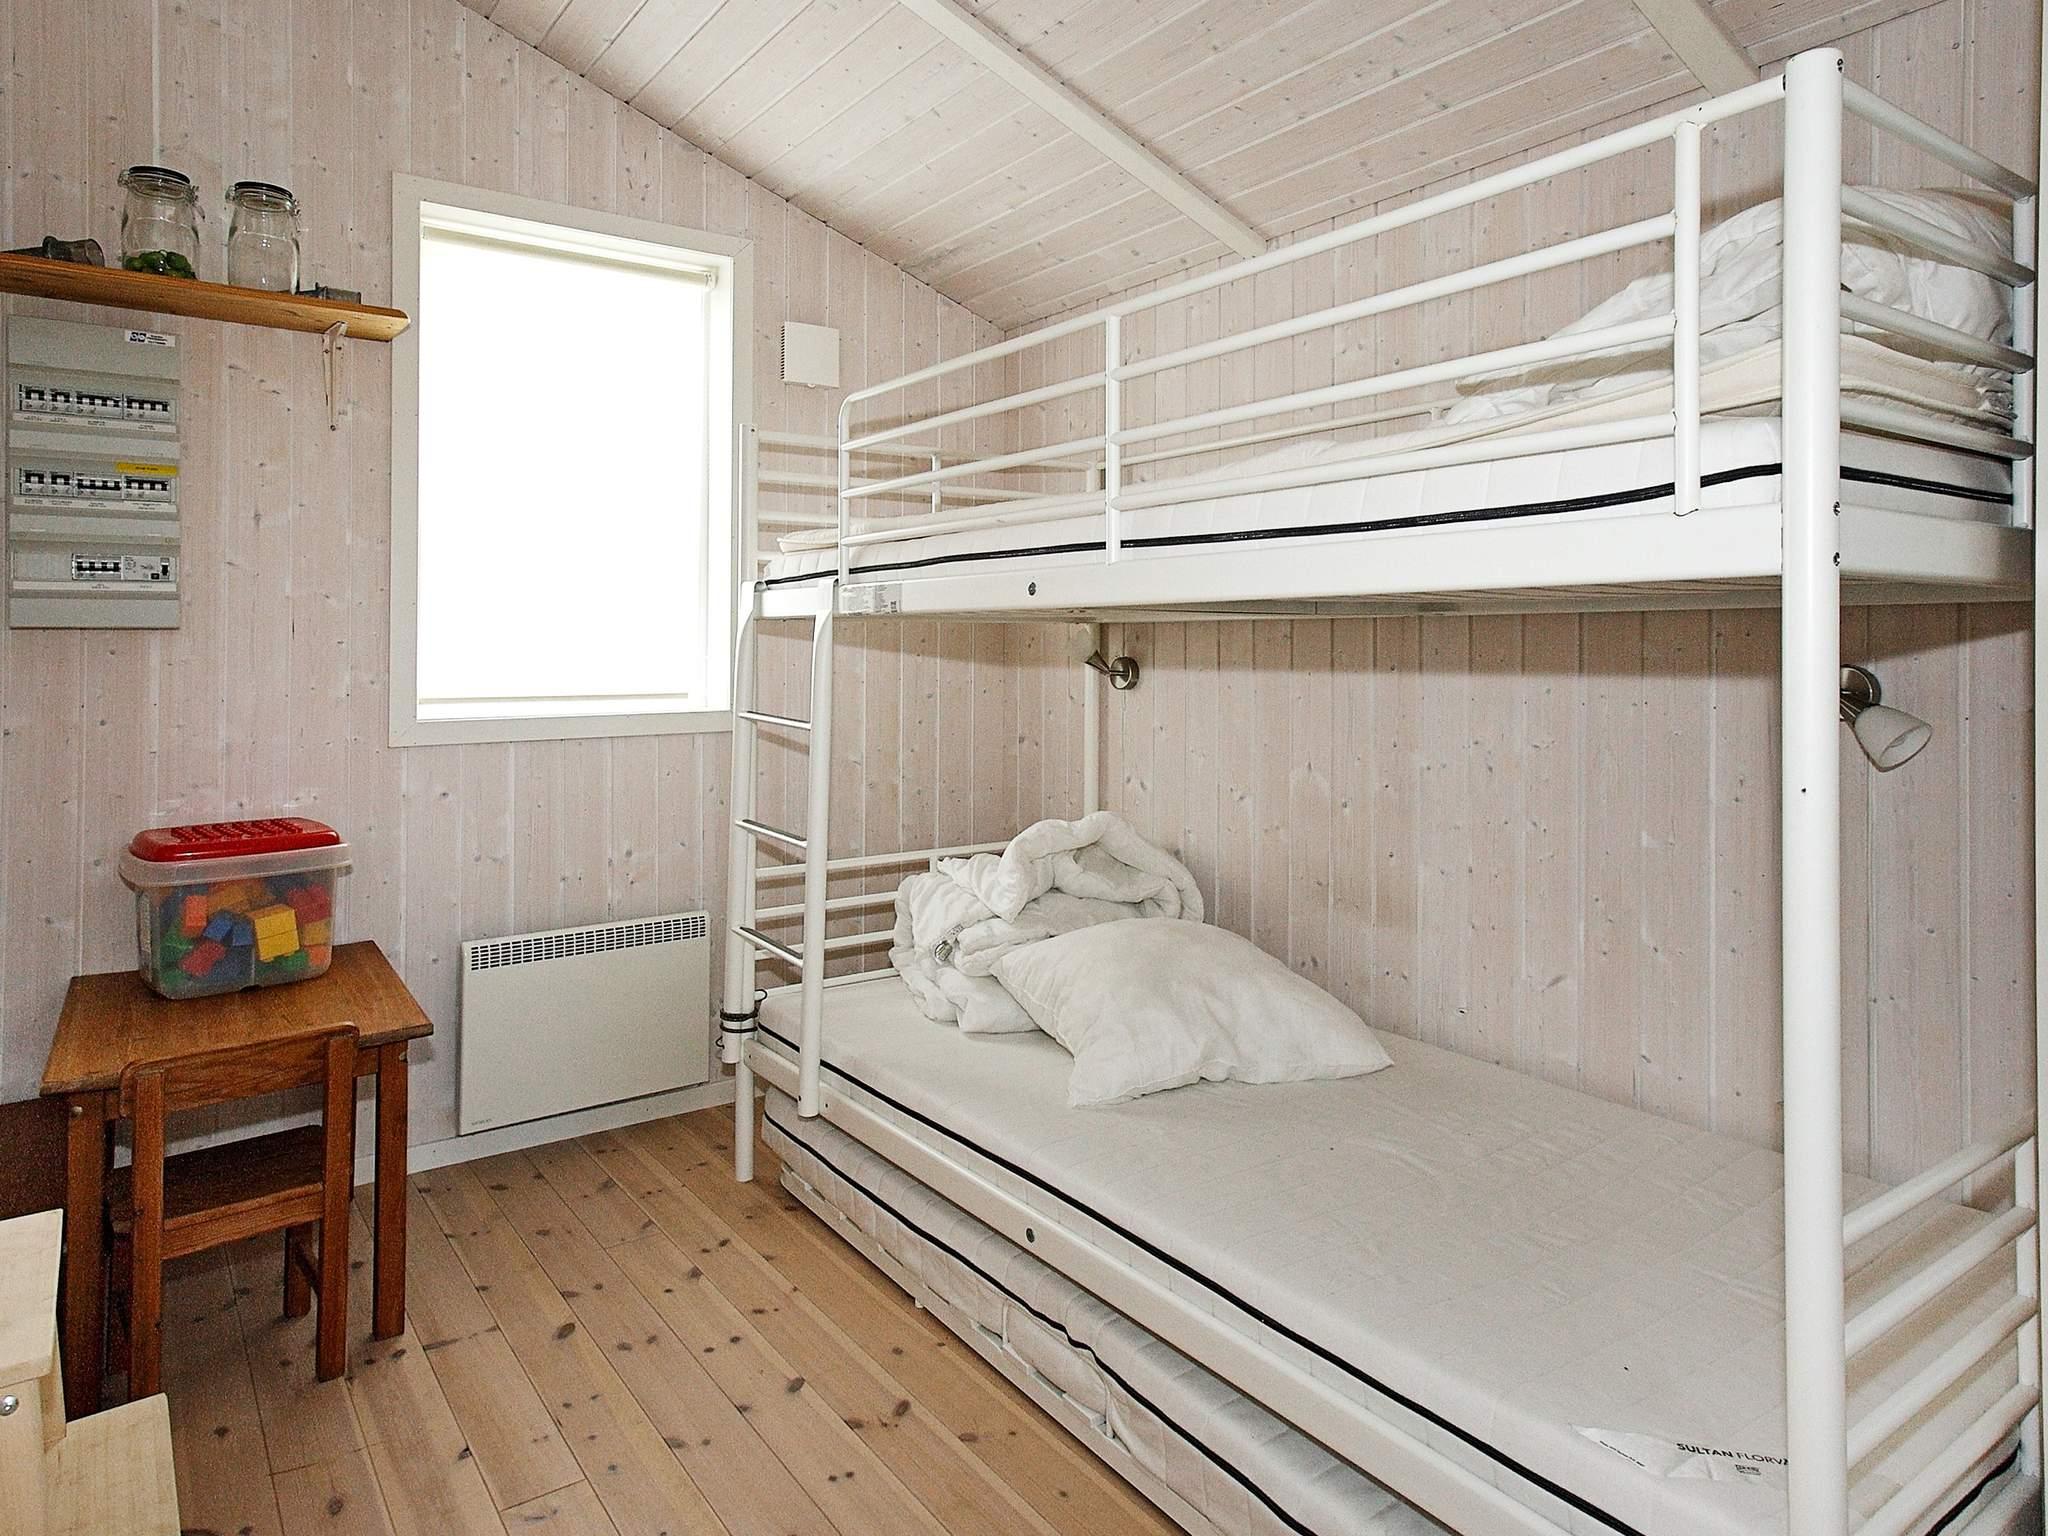 Ferienhaus Øster Hurup (1079907), Øster Hurup, , Ostjütland, Dänemark, Bild 8